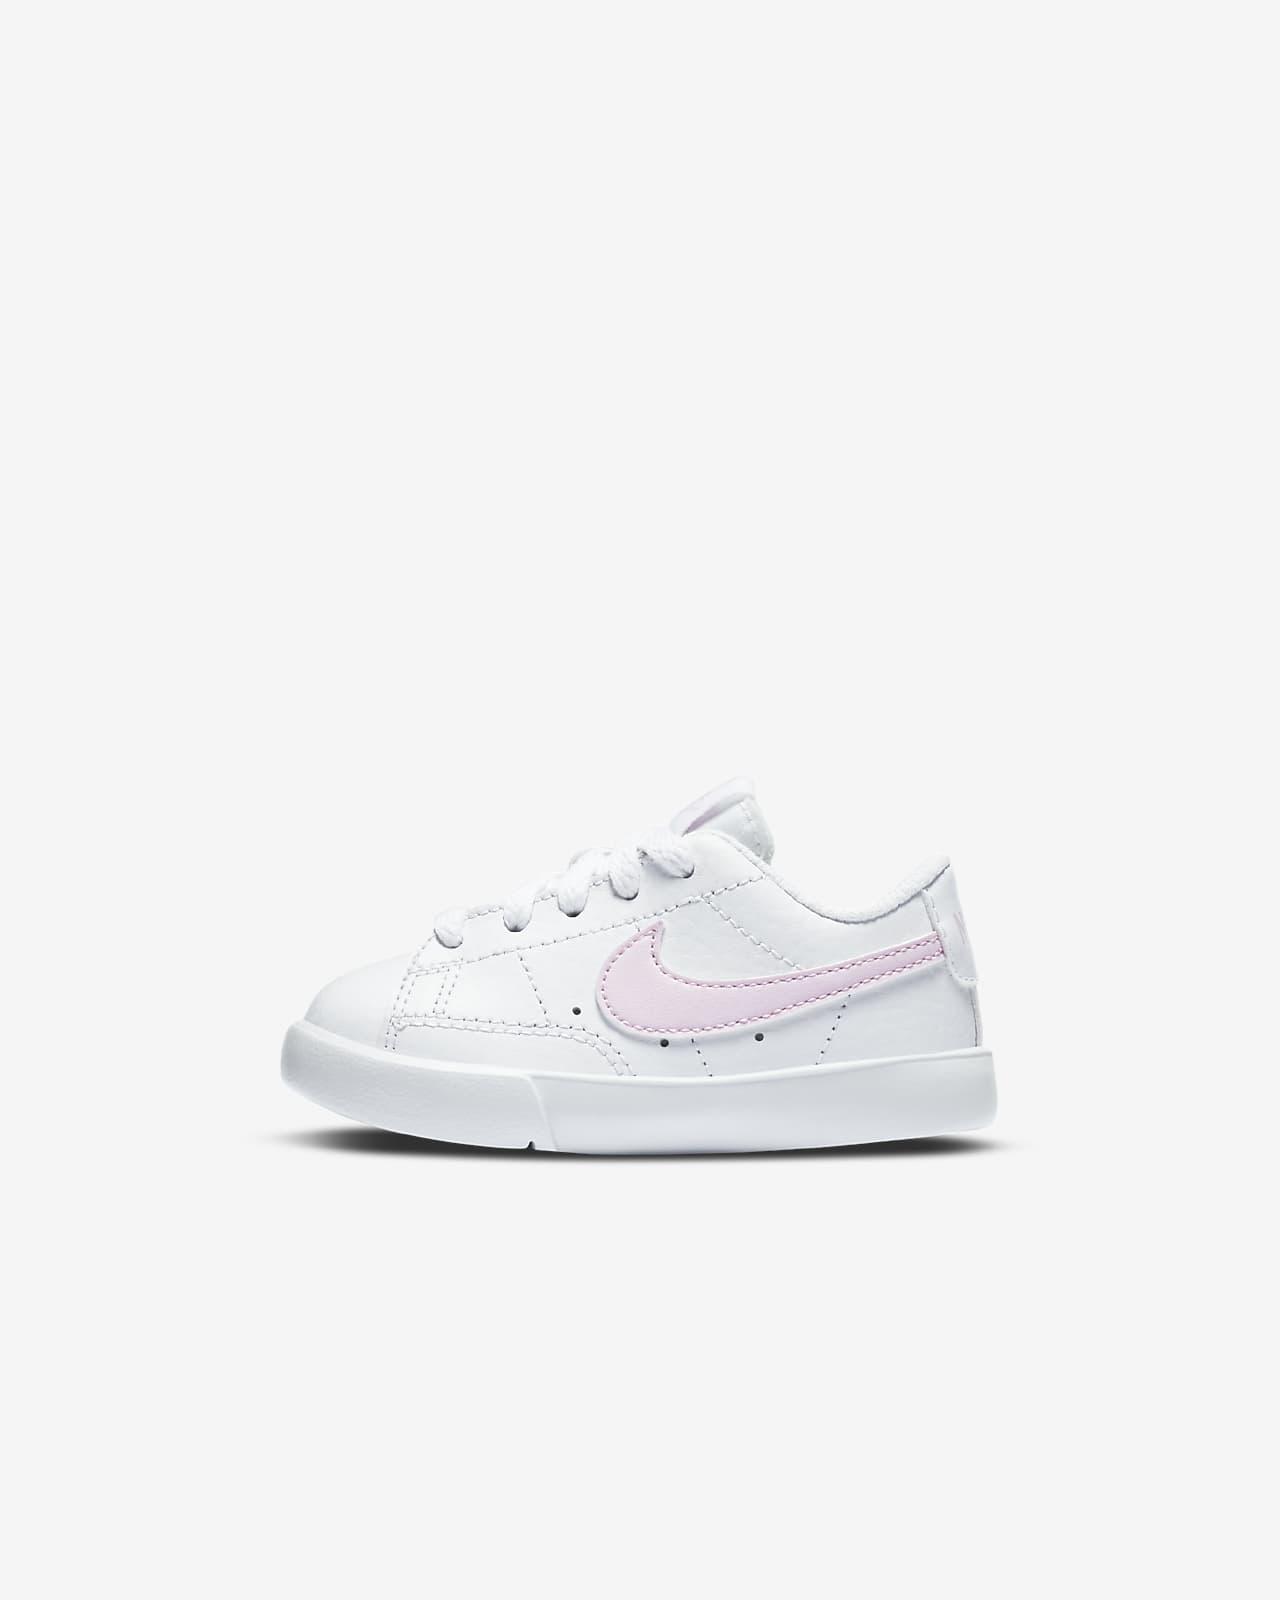 Nike Blazer Low Baby and Toddler Shoe